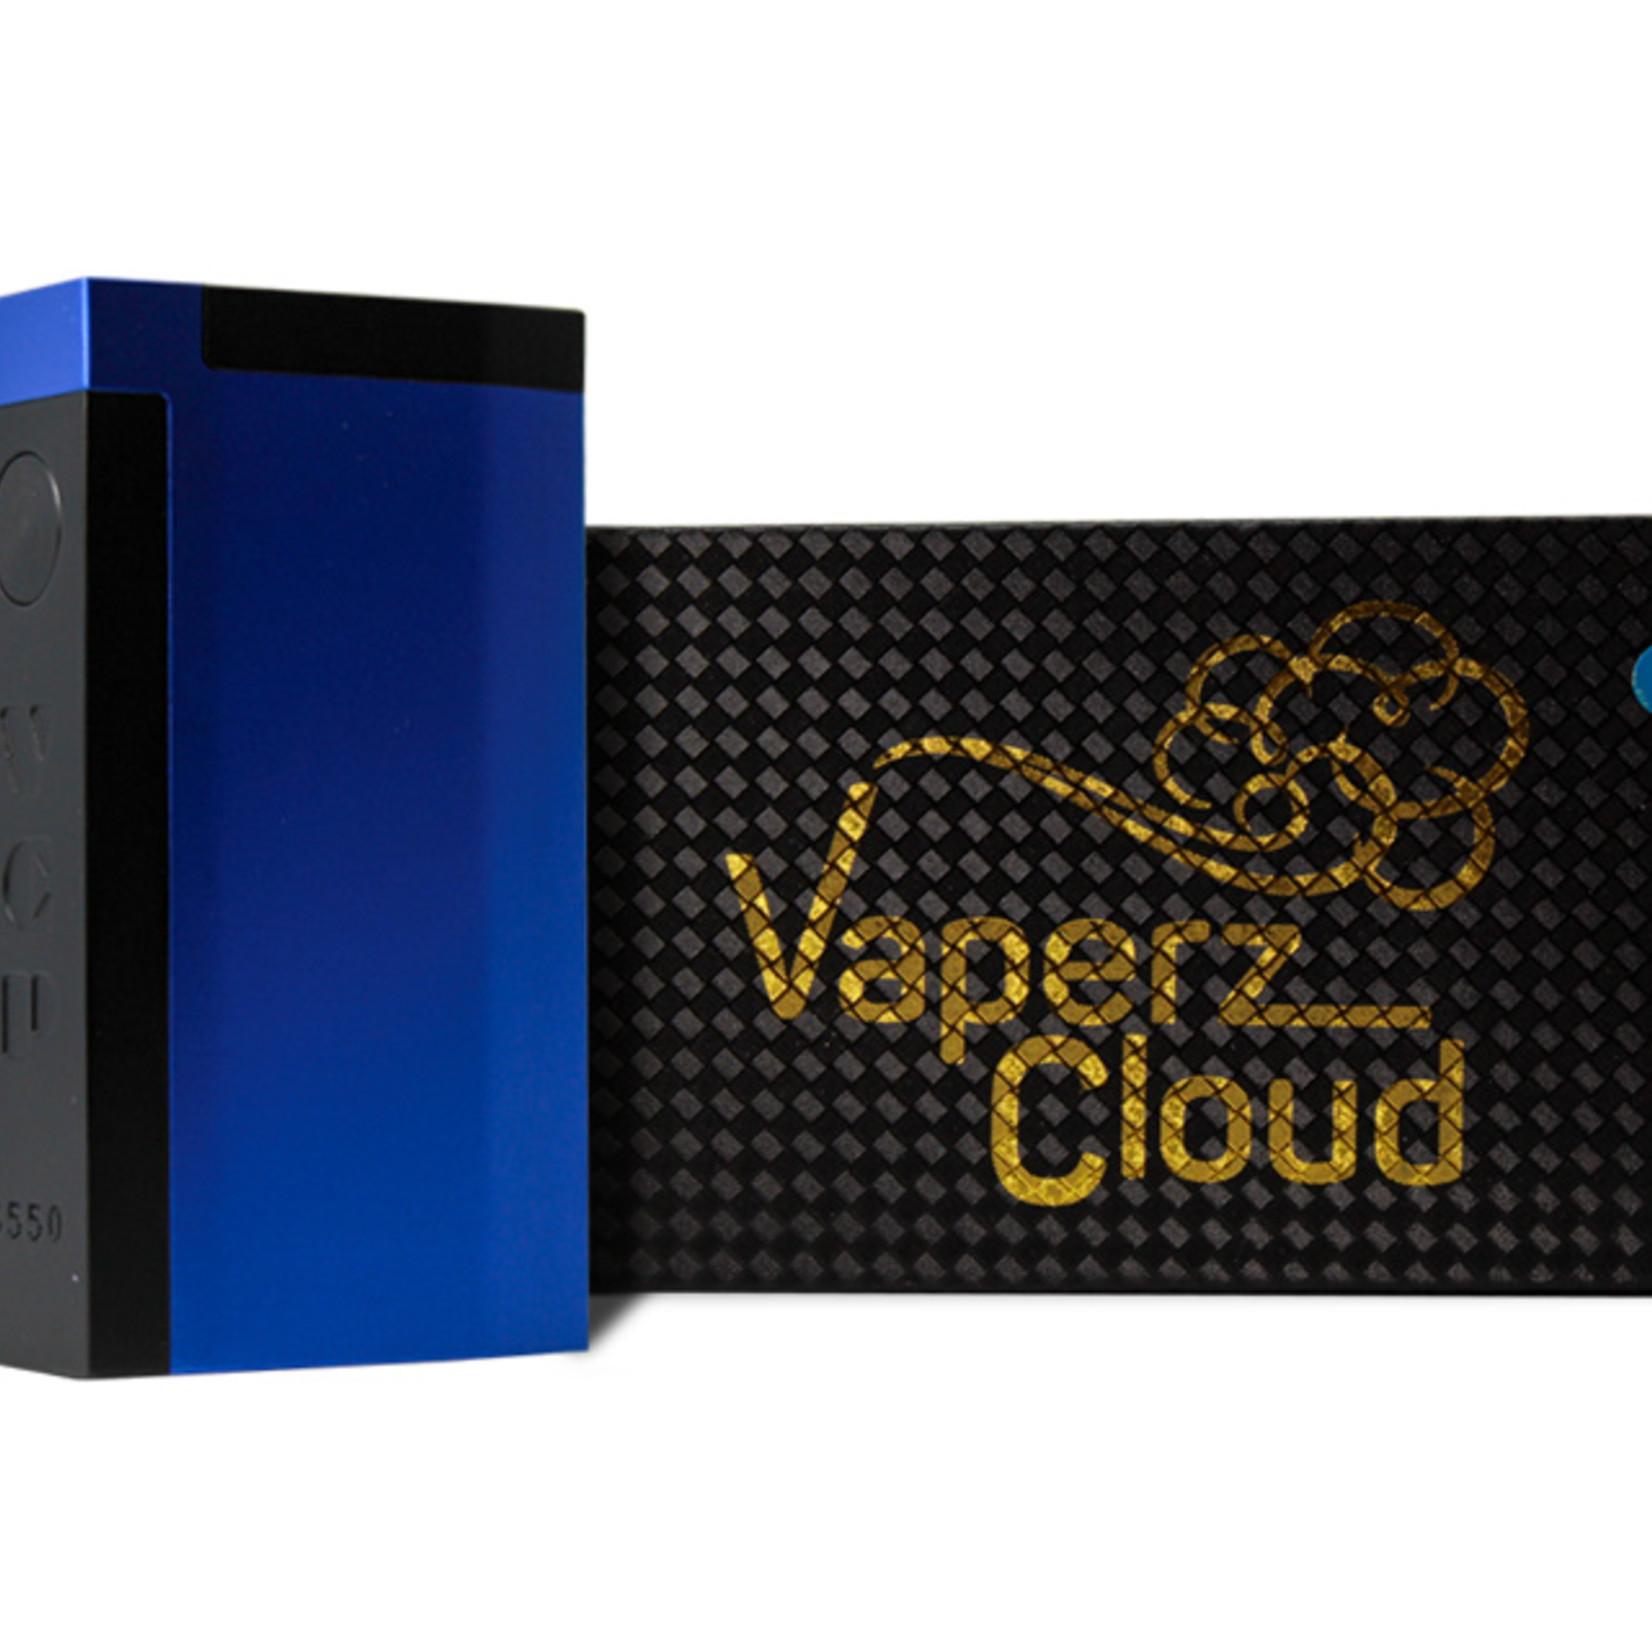 § Vaperz Cloud VCP Mod